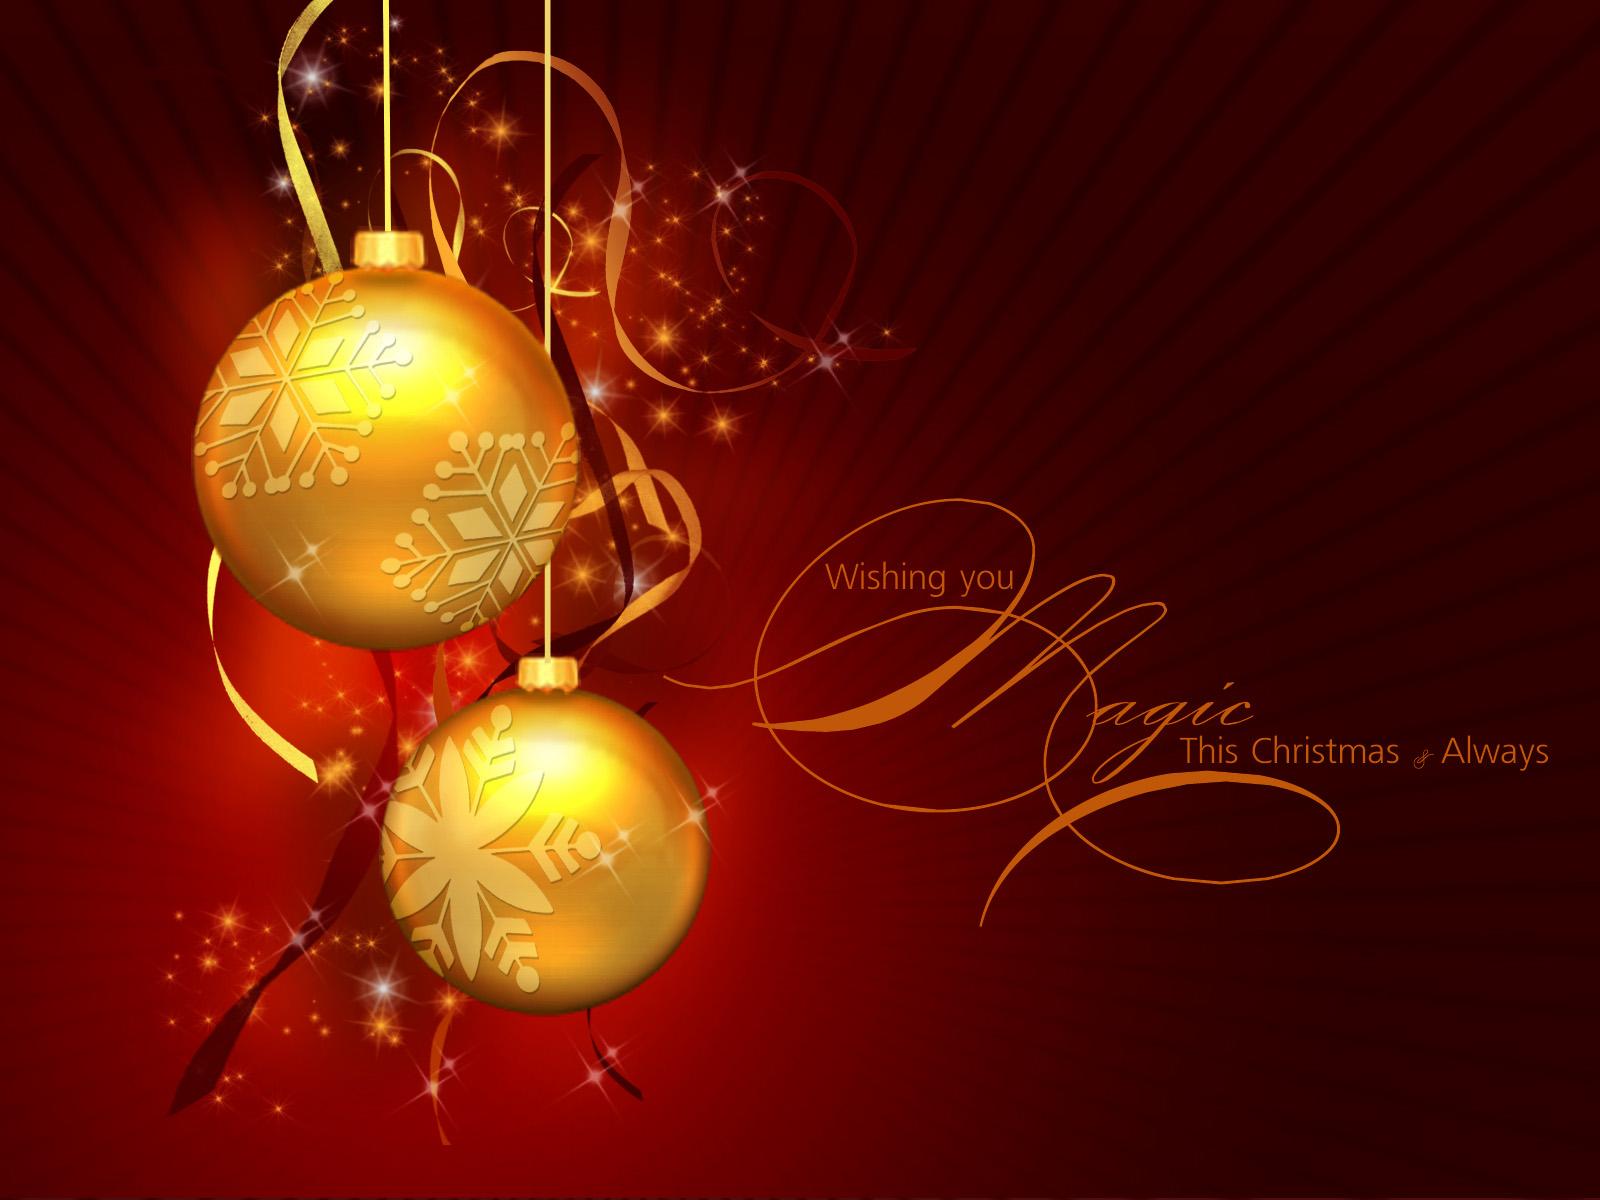 78] Christmas Wallpapers Desktop on WallpaperSafari 1600x1200